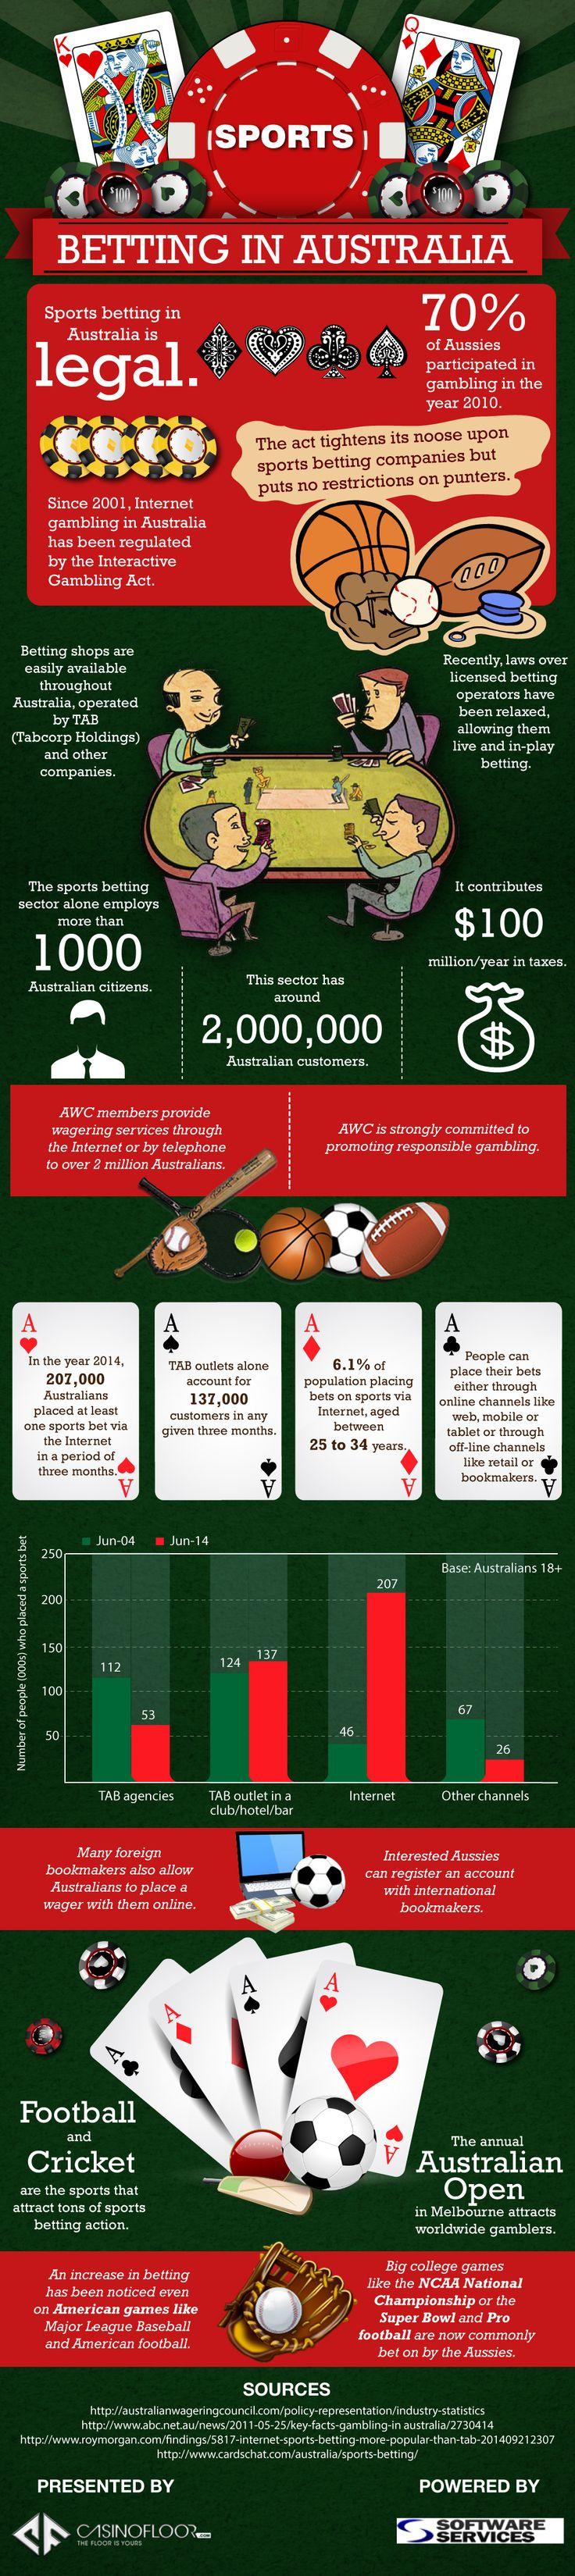 Sports betting statistics australia time betting zone horse tips singapore